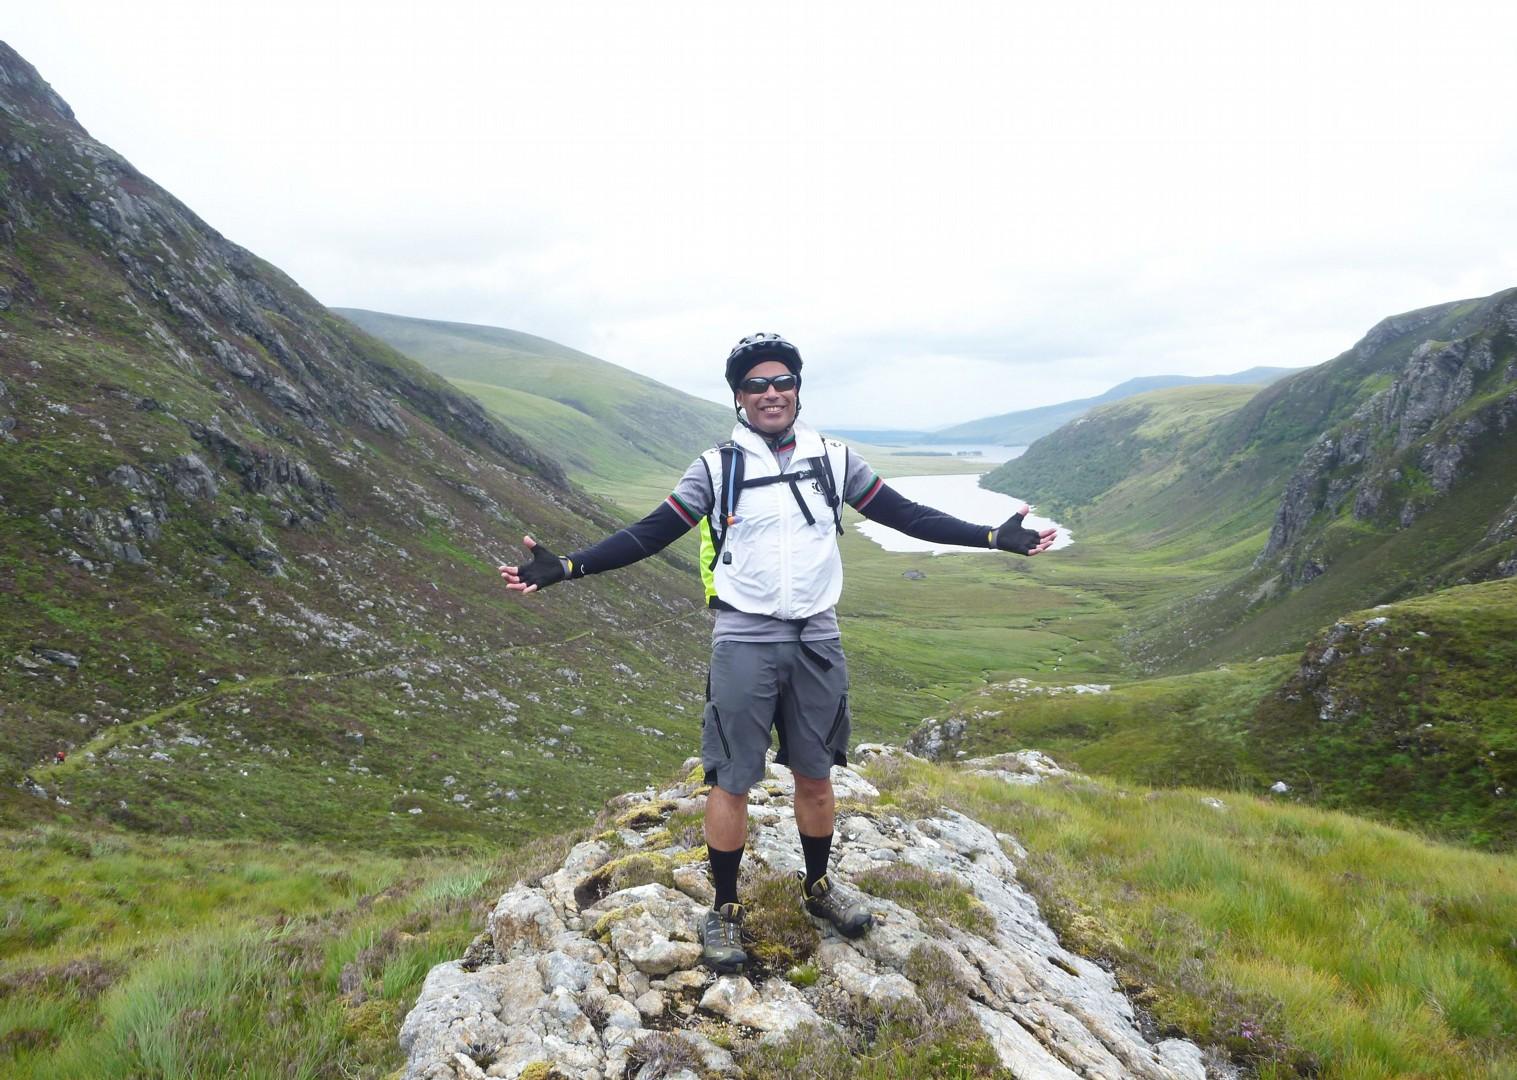 views-scottish-highlands-adventure-mountain-biking.jpg - Scotland - Celtic Crossing - Guided Mountain Bike Holiday - Mountain Biking